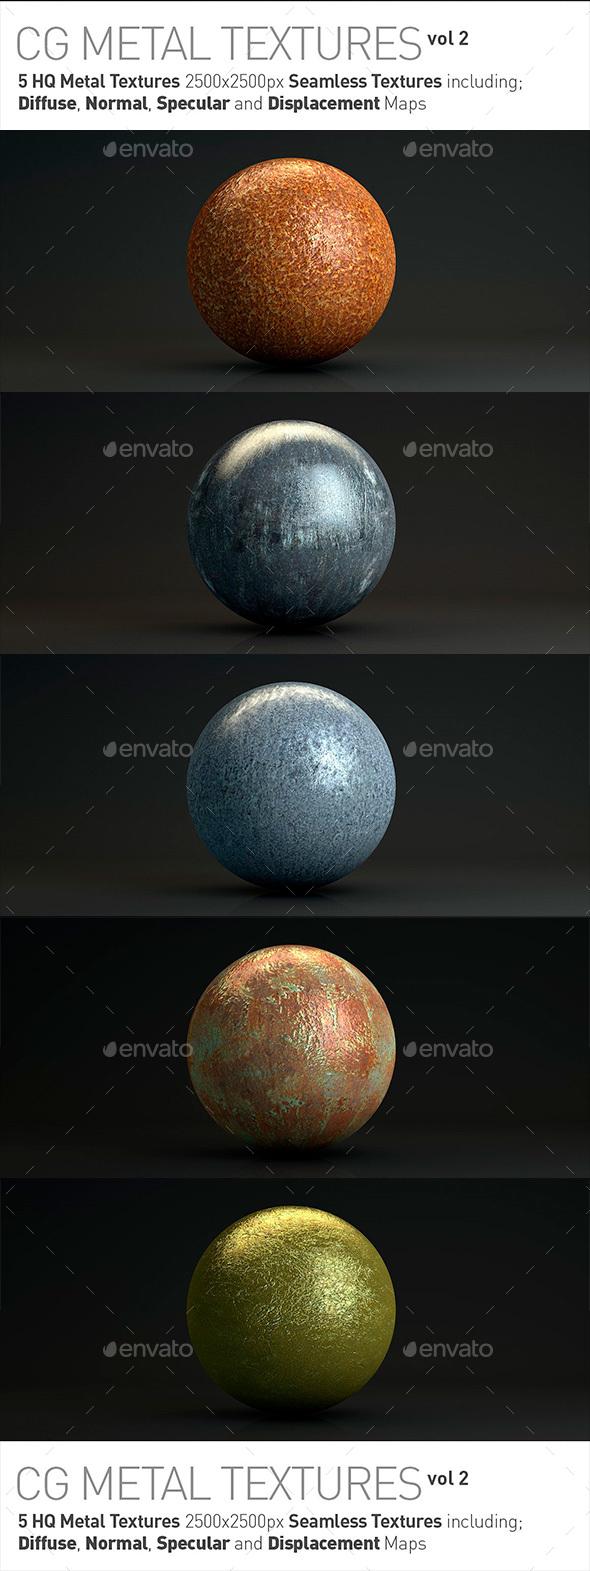 5 Metal Textures for CG Artists Vol 2 - Metal Textures